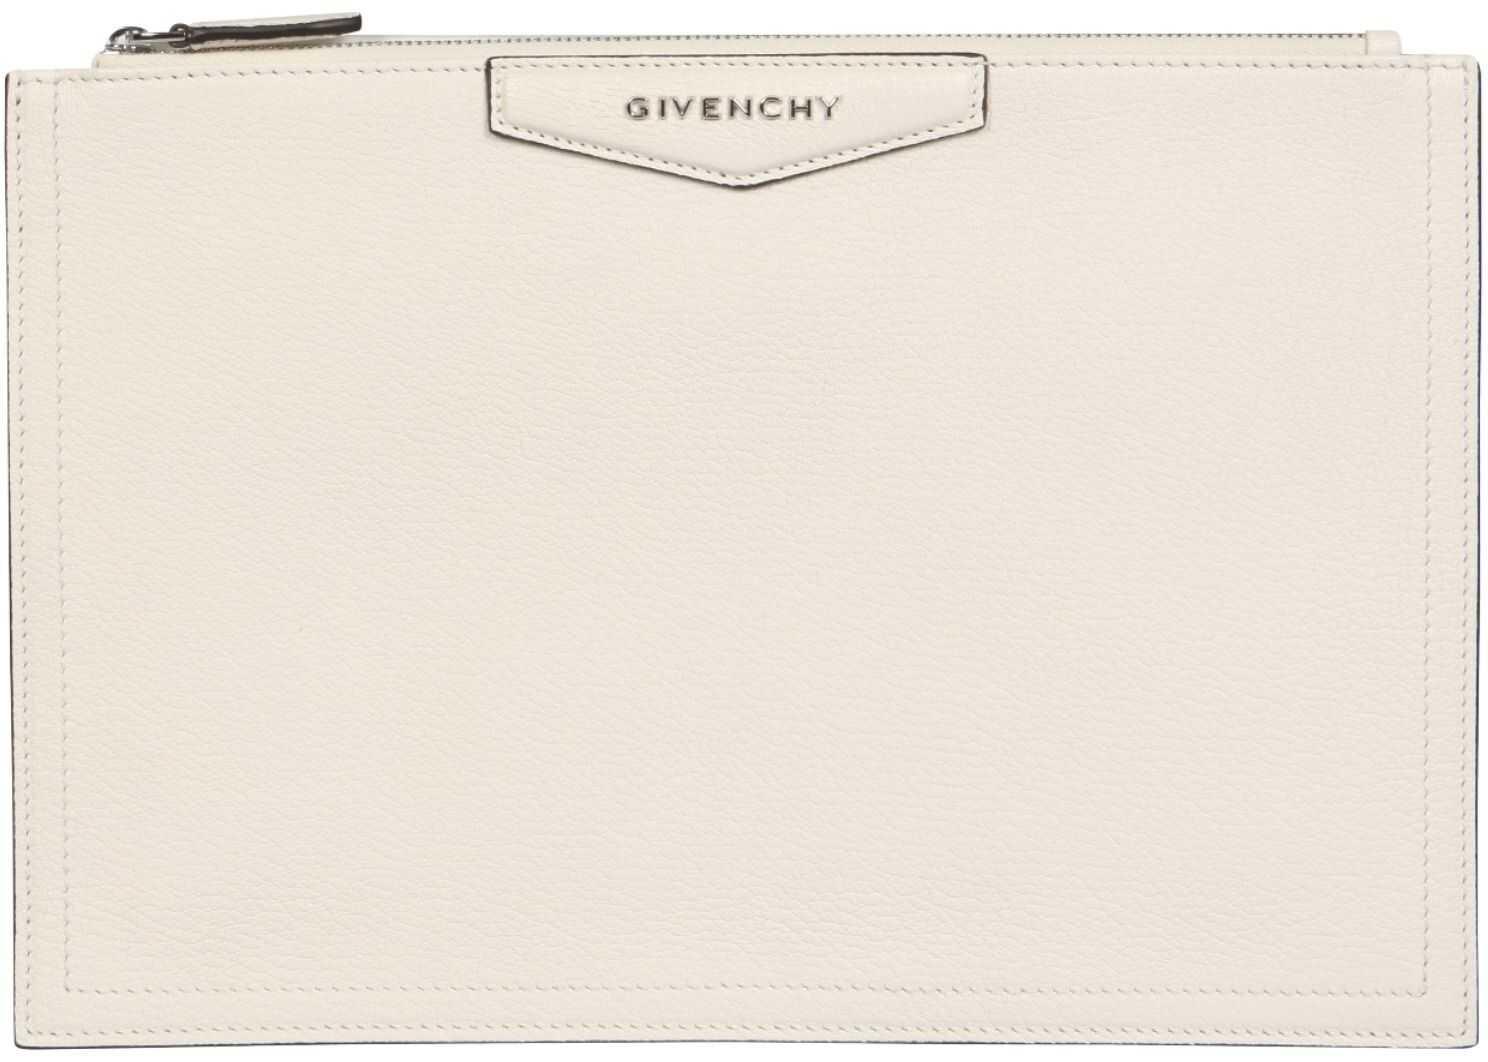 Givenchy Antigona Pouch BB609CB00B_105 WHITE imagine b-mall.ro